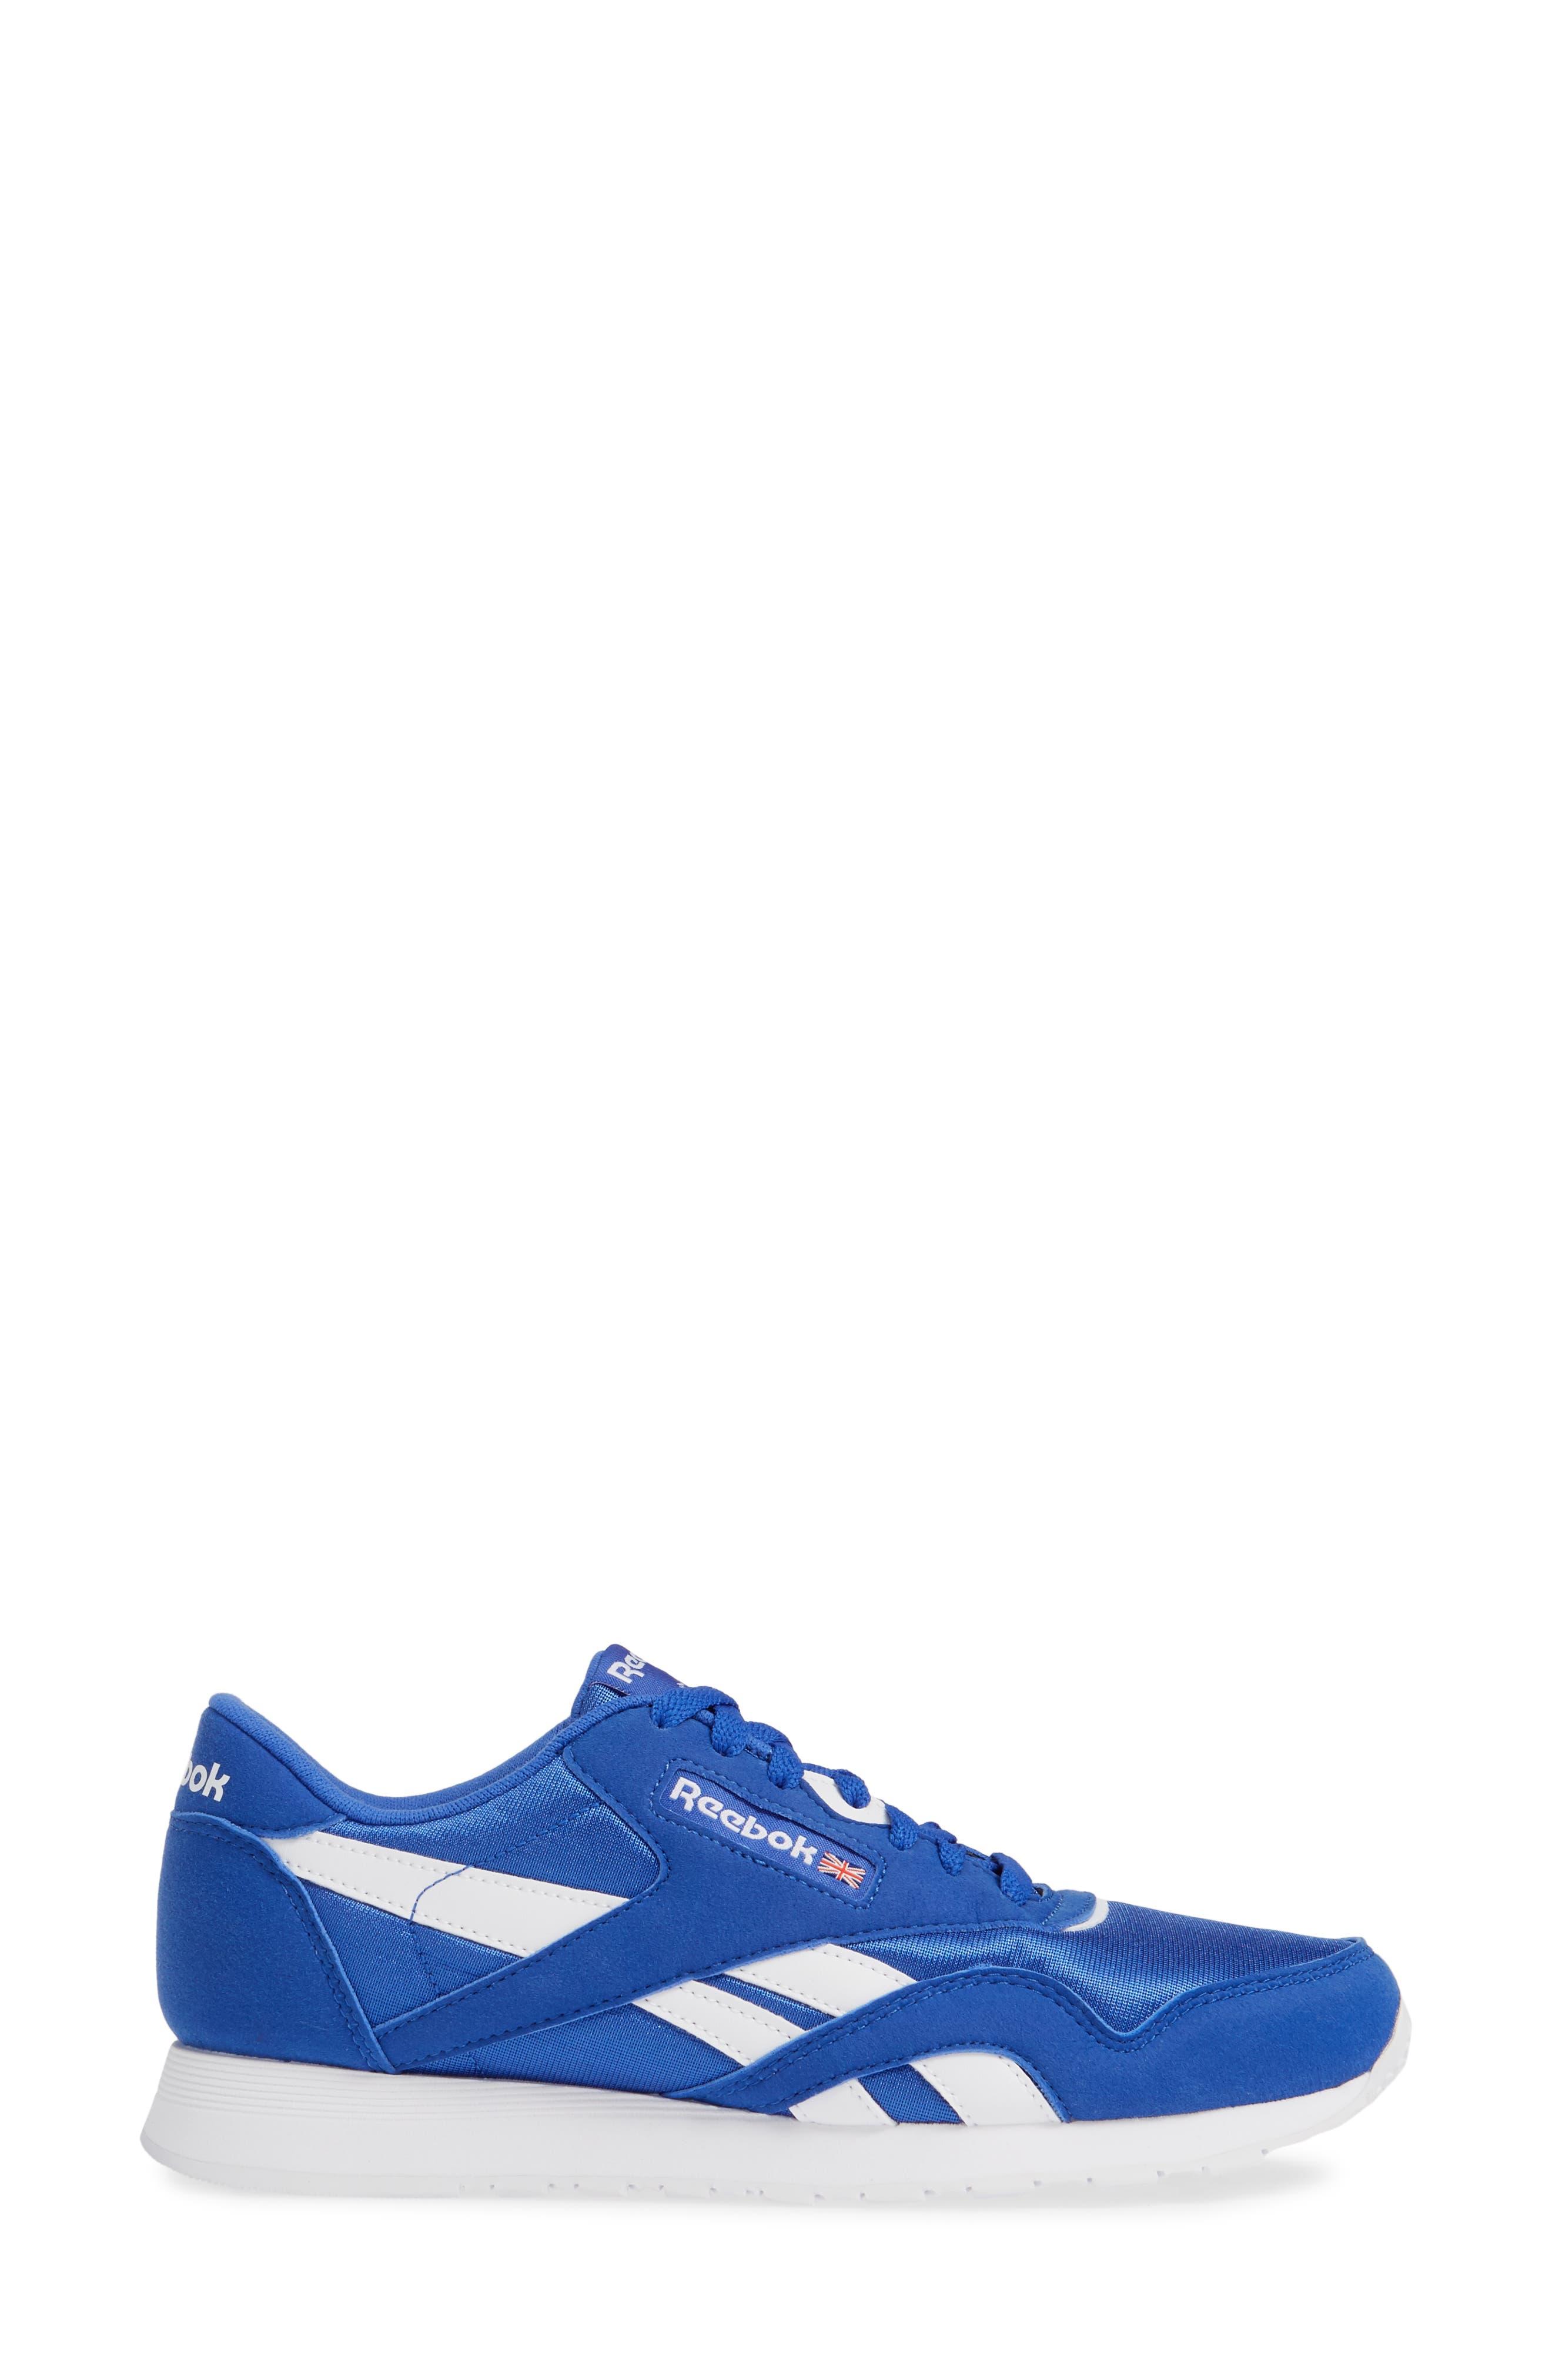 Classic Nylon Sneaker,                             Alternate thumbnail 3, color,                             401